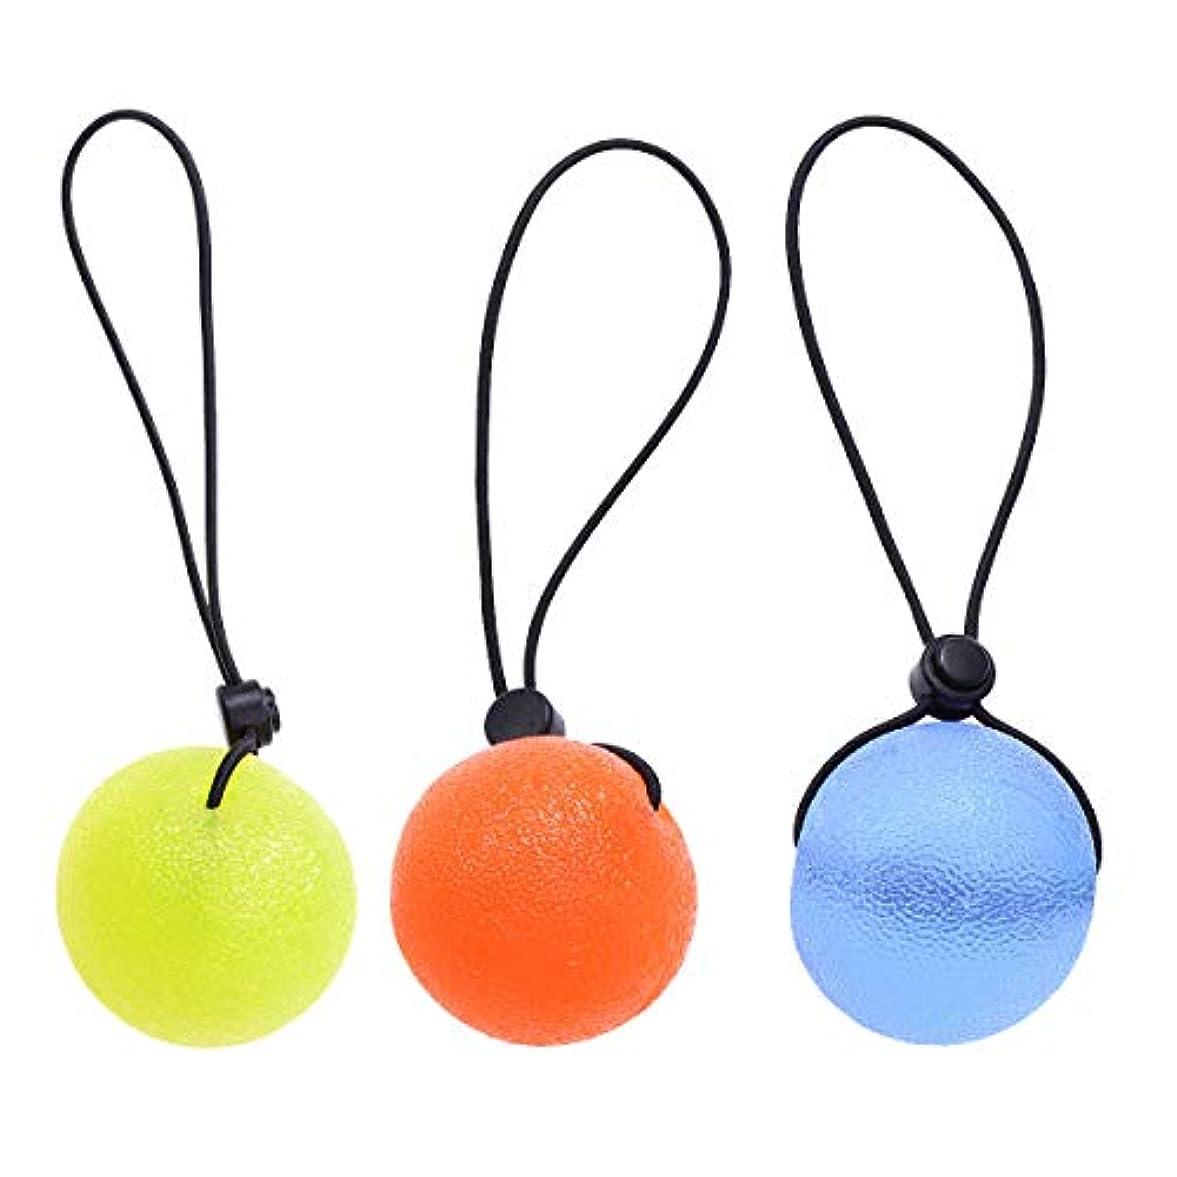 SUPVOX 3個ハンドグリップ強化剤フィンガーグリップセラピーエクササイズスクイズストレスボール